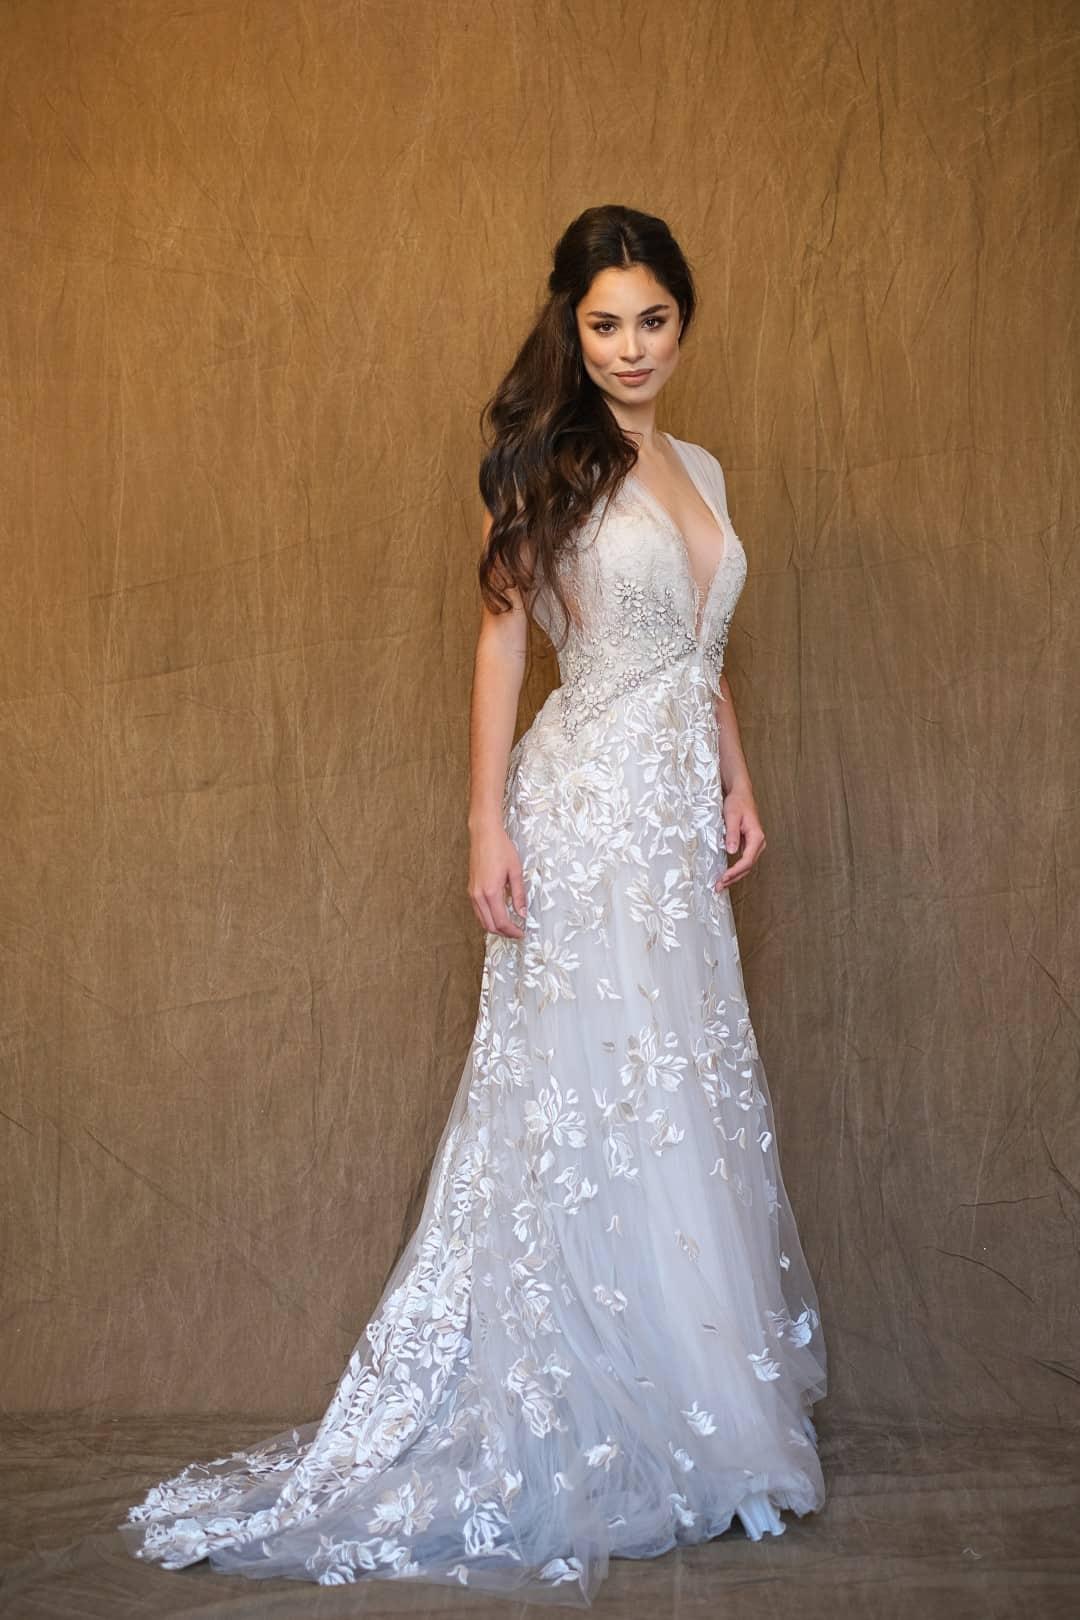 Jemné a romantické svadobné šaty - Marco&Maria - 2017-1017- front